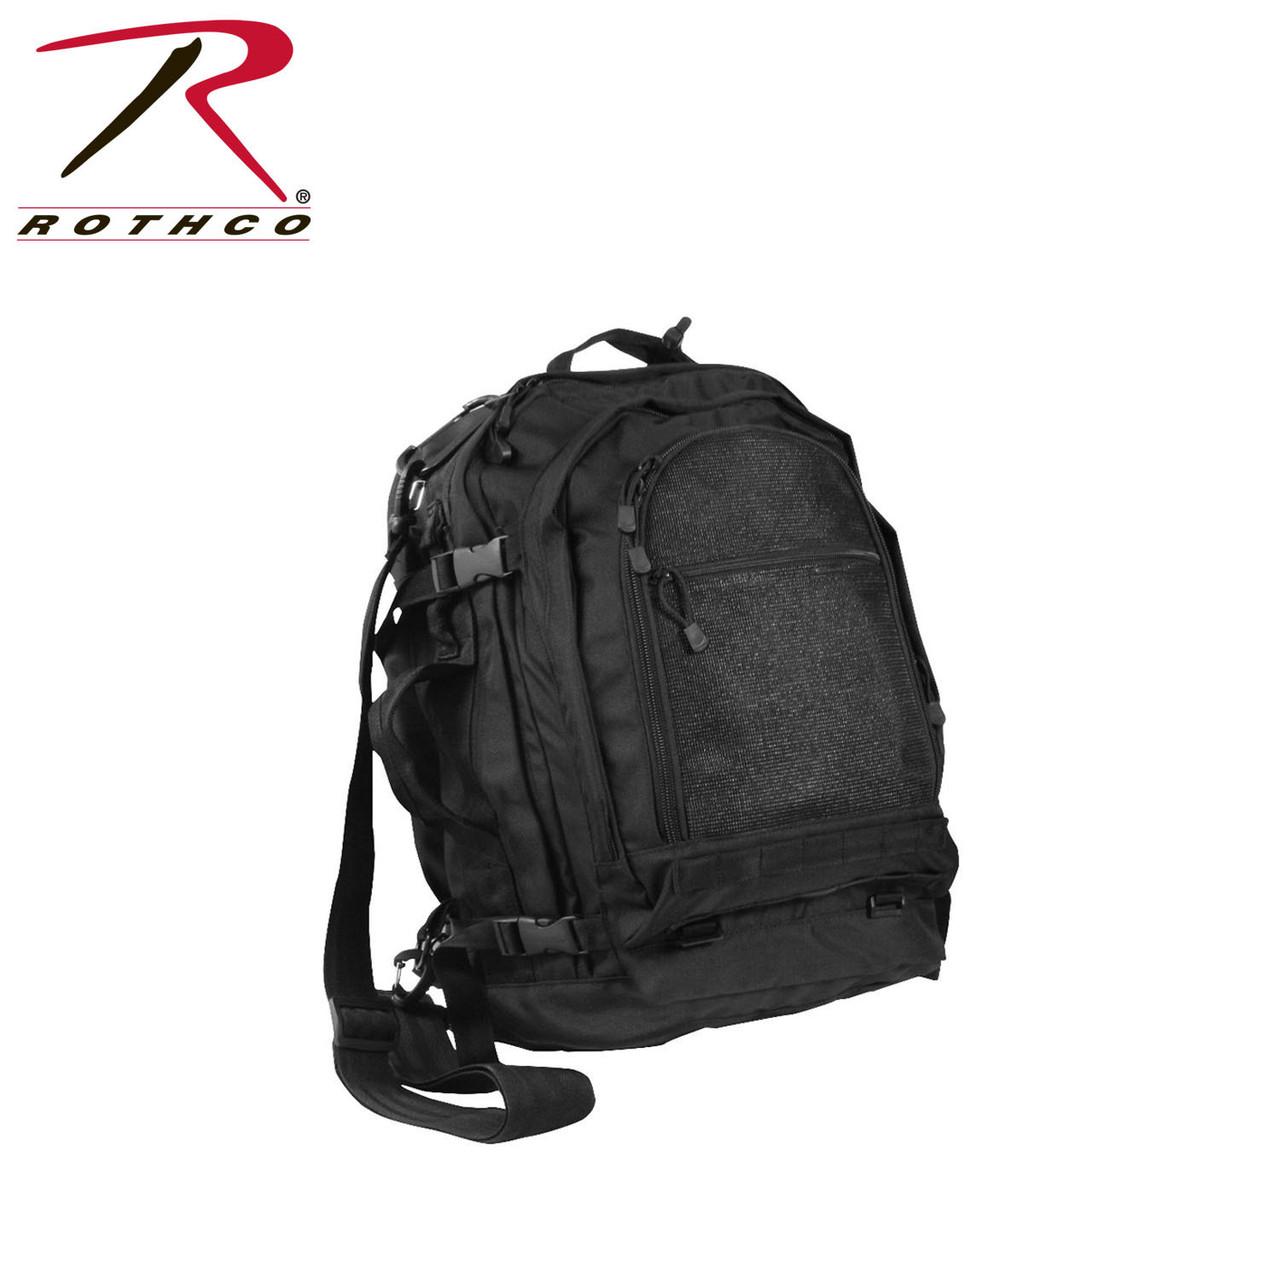 Backpacks, Bags, & Duffles